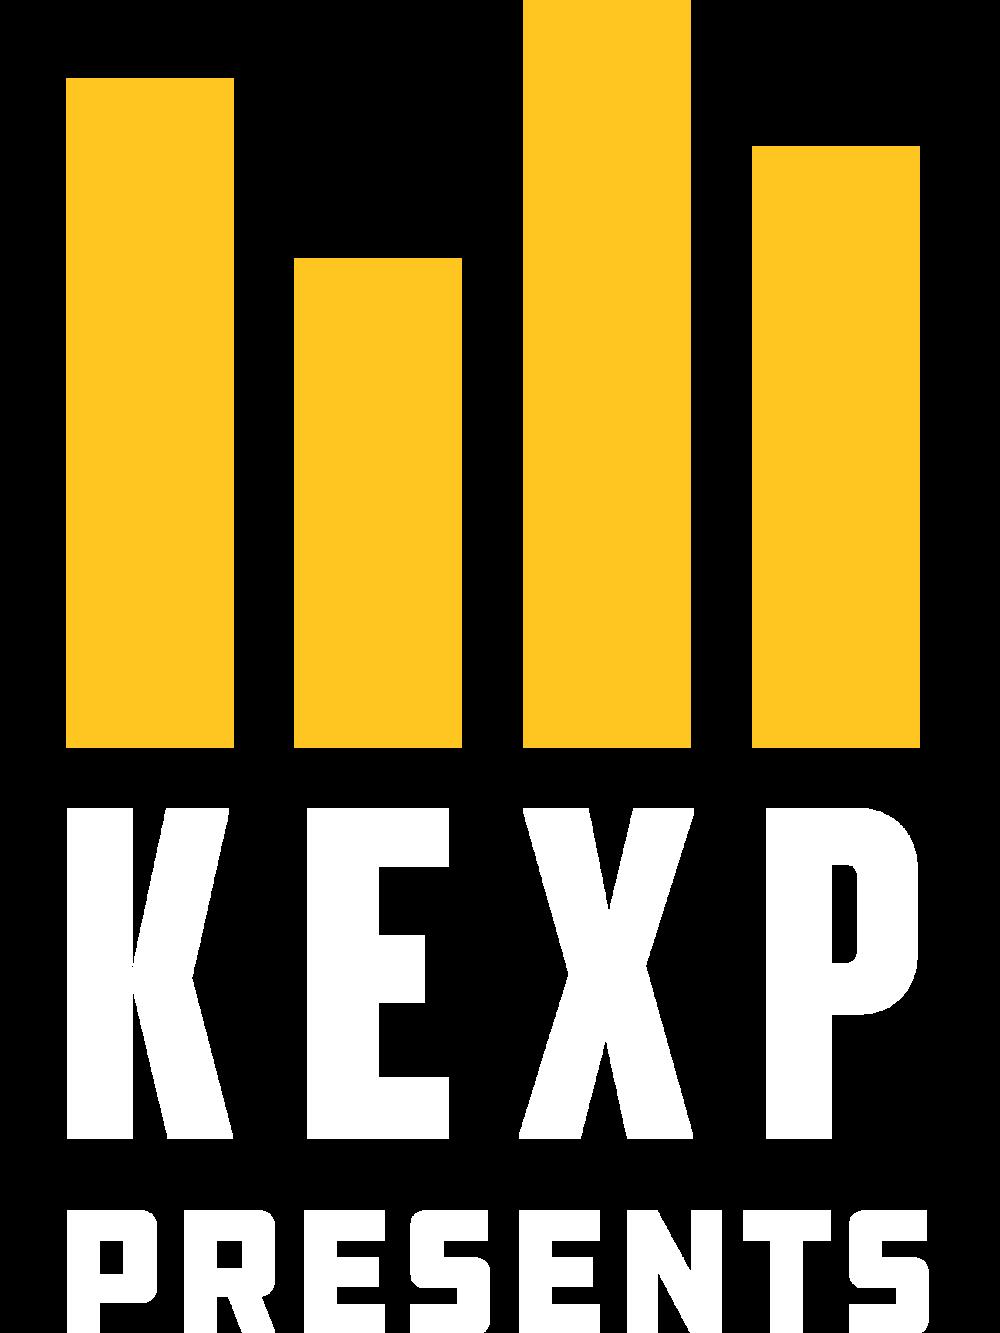 KEXP-Logo-1.png